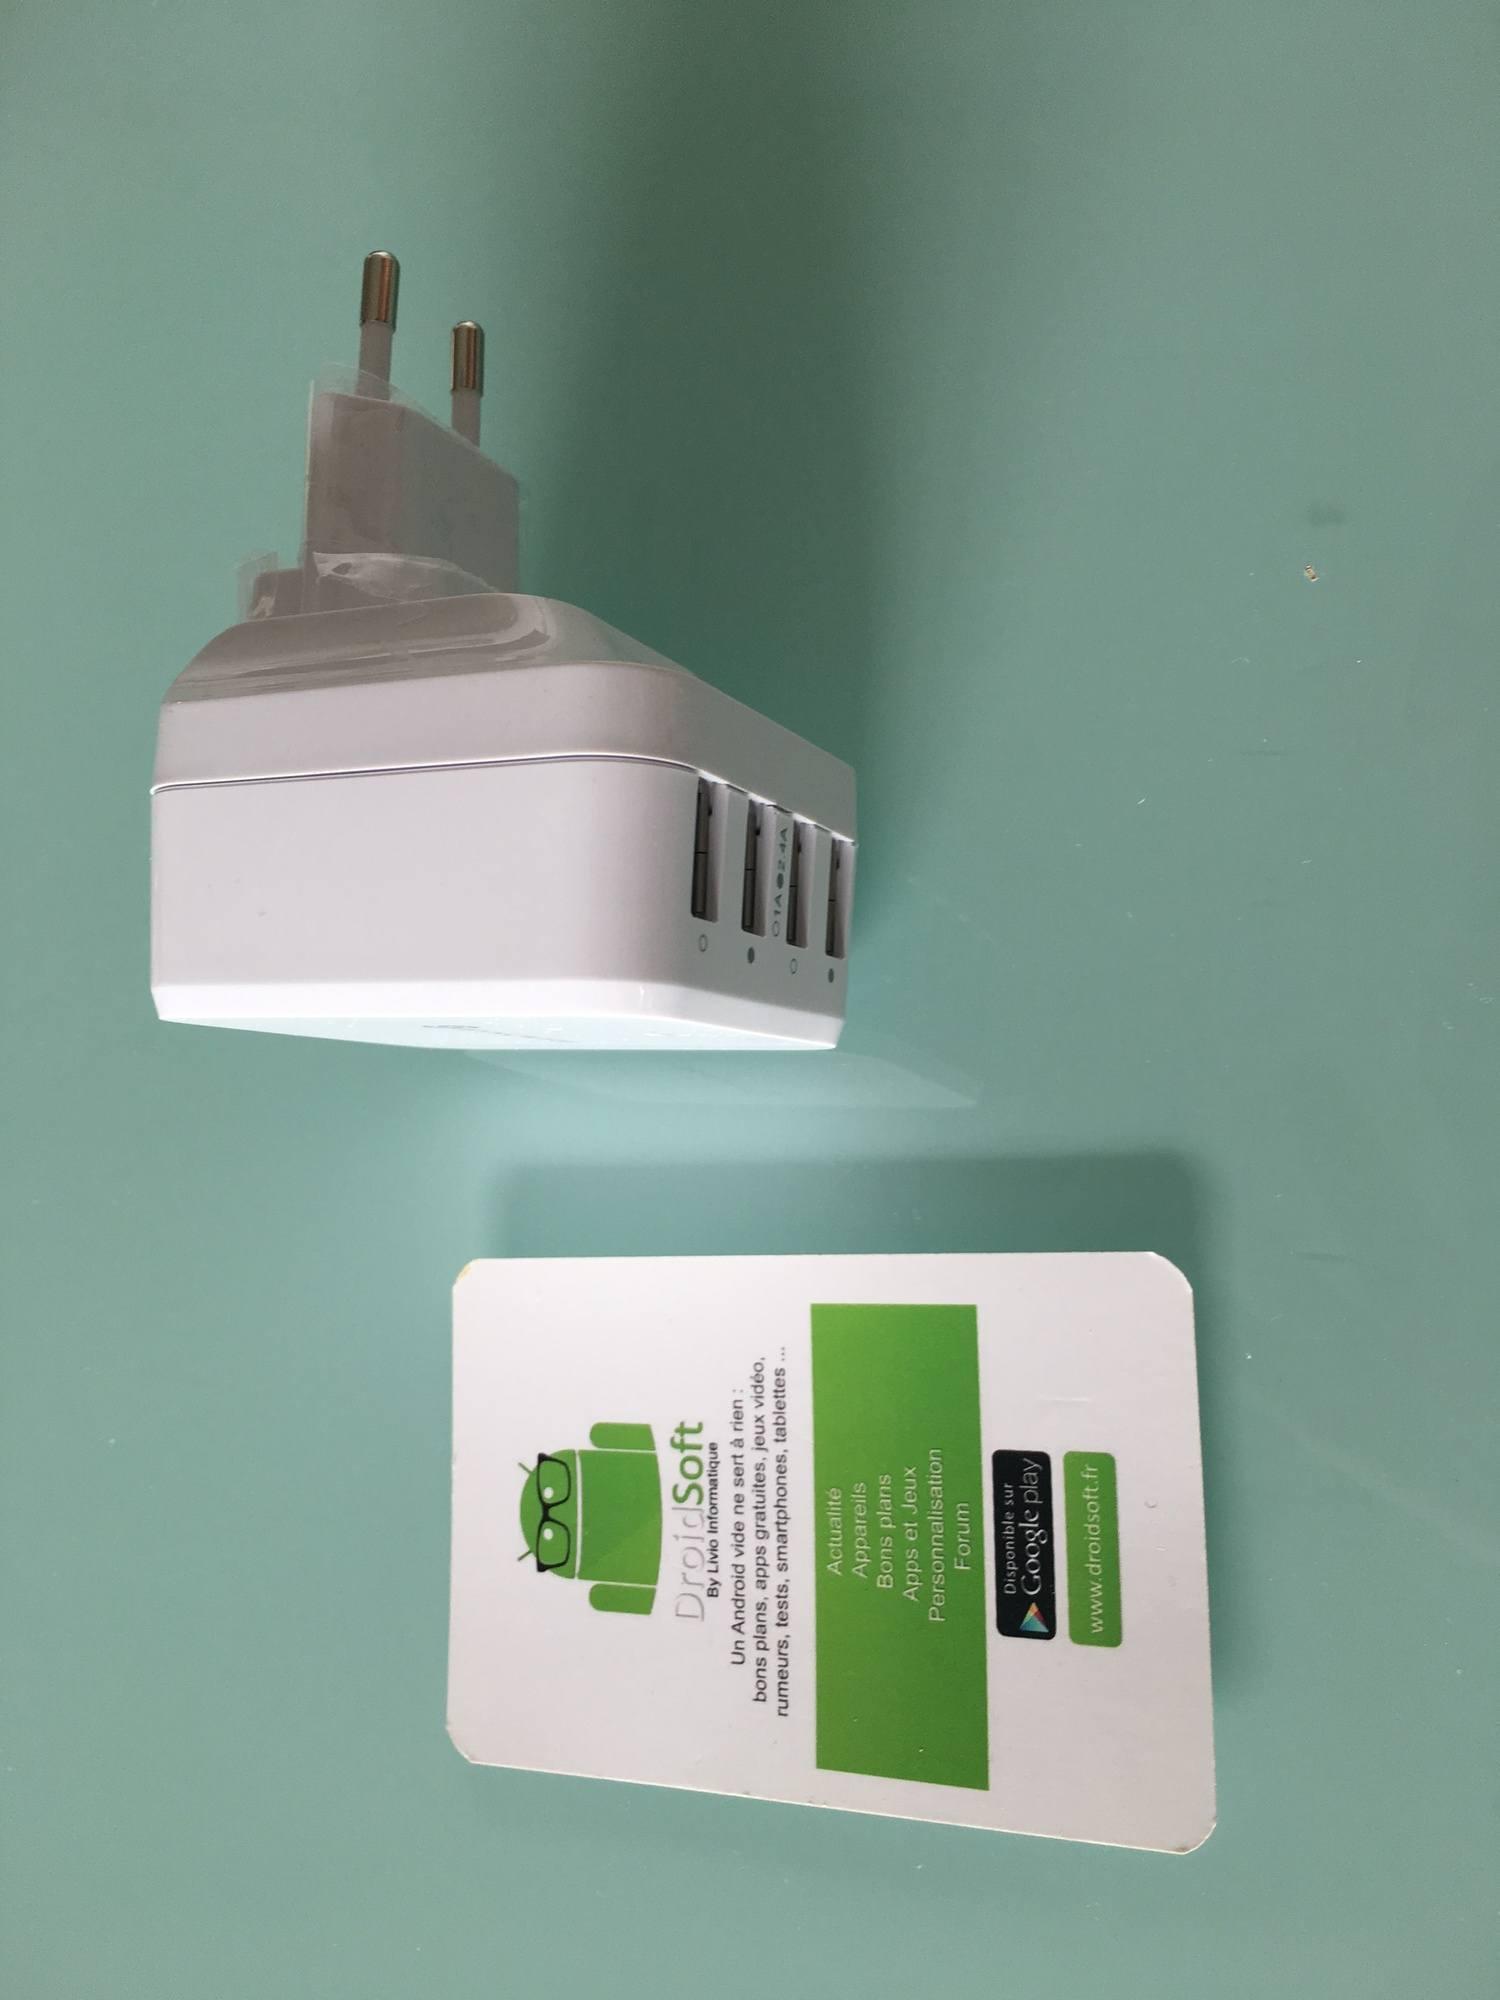 , Test : Chargeur USB Syncwire 4 ports avec adaptateur prise universel EU/UK/US